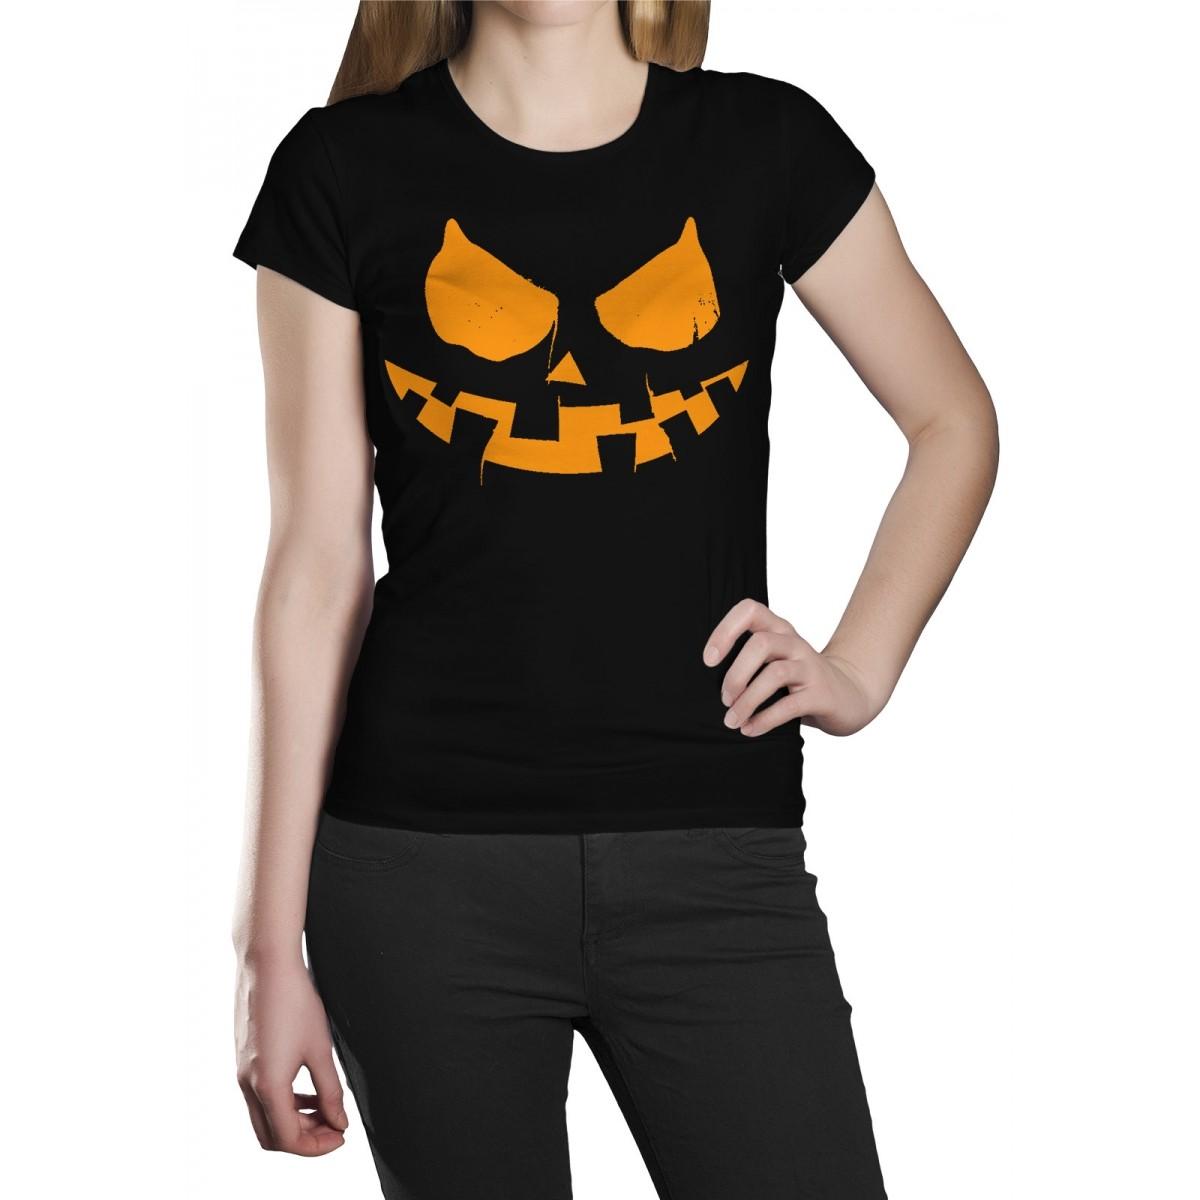 Camiseta Geek Pride Jack Lantern Preto  - HShop